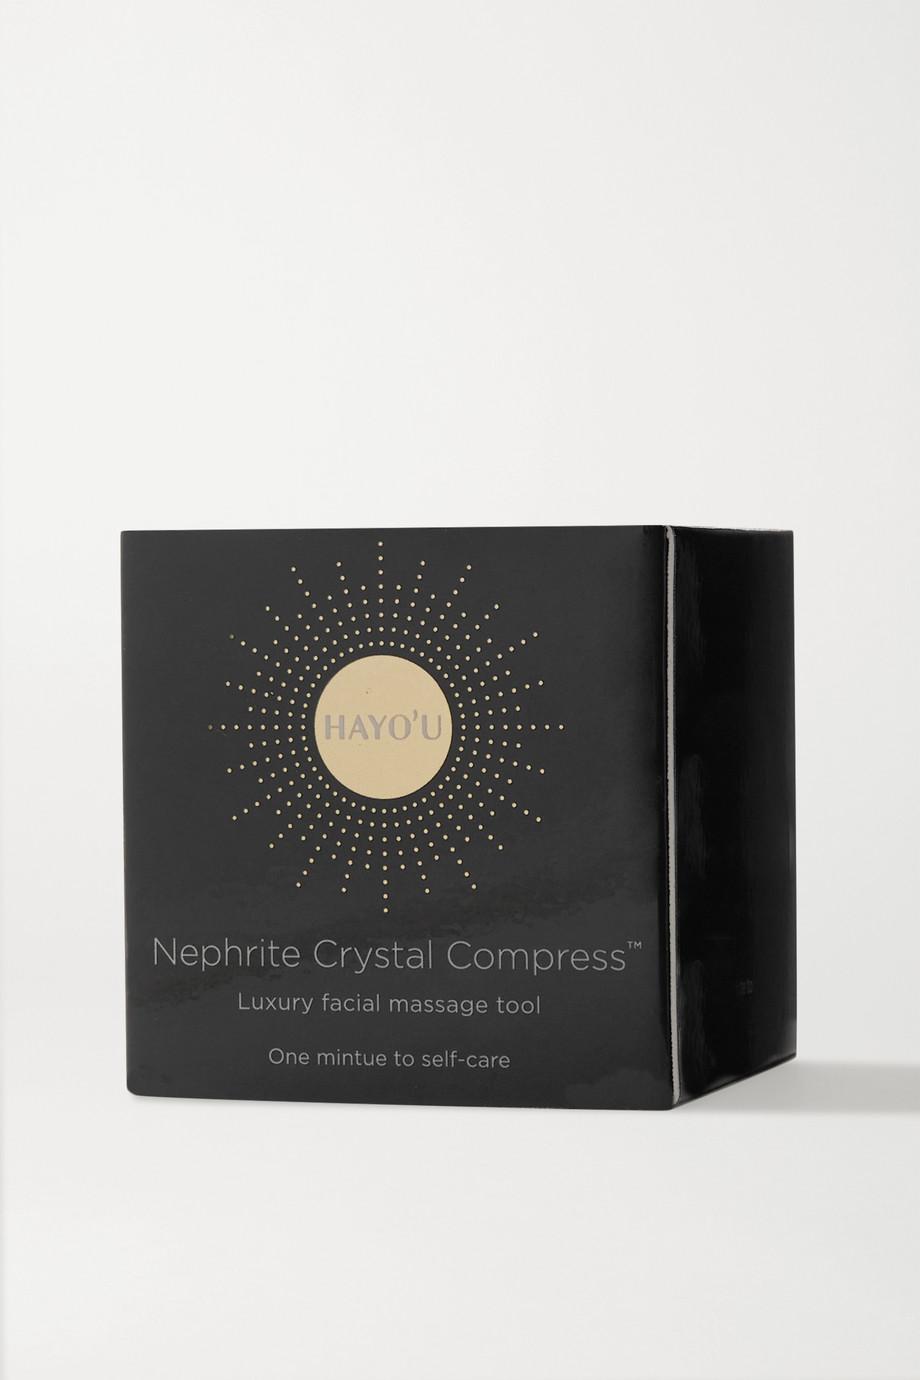 Hayo'u Nephrite Crystal Compress